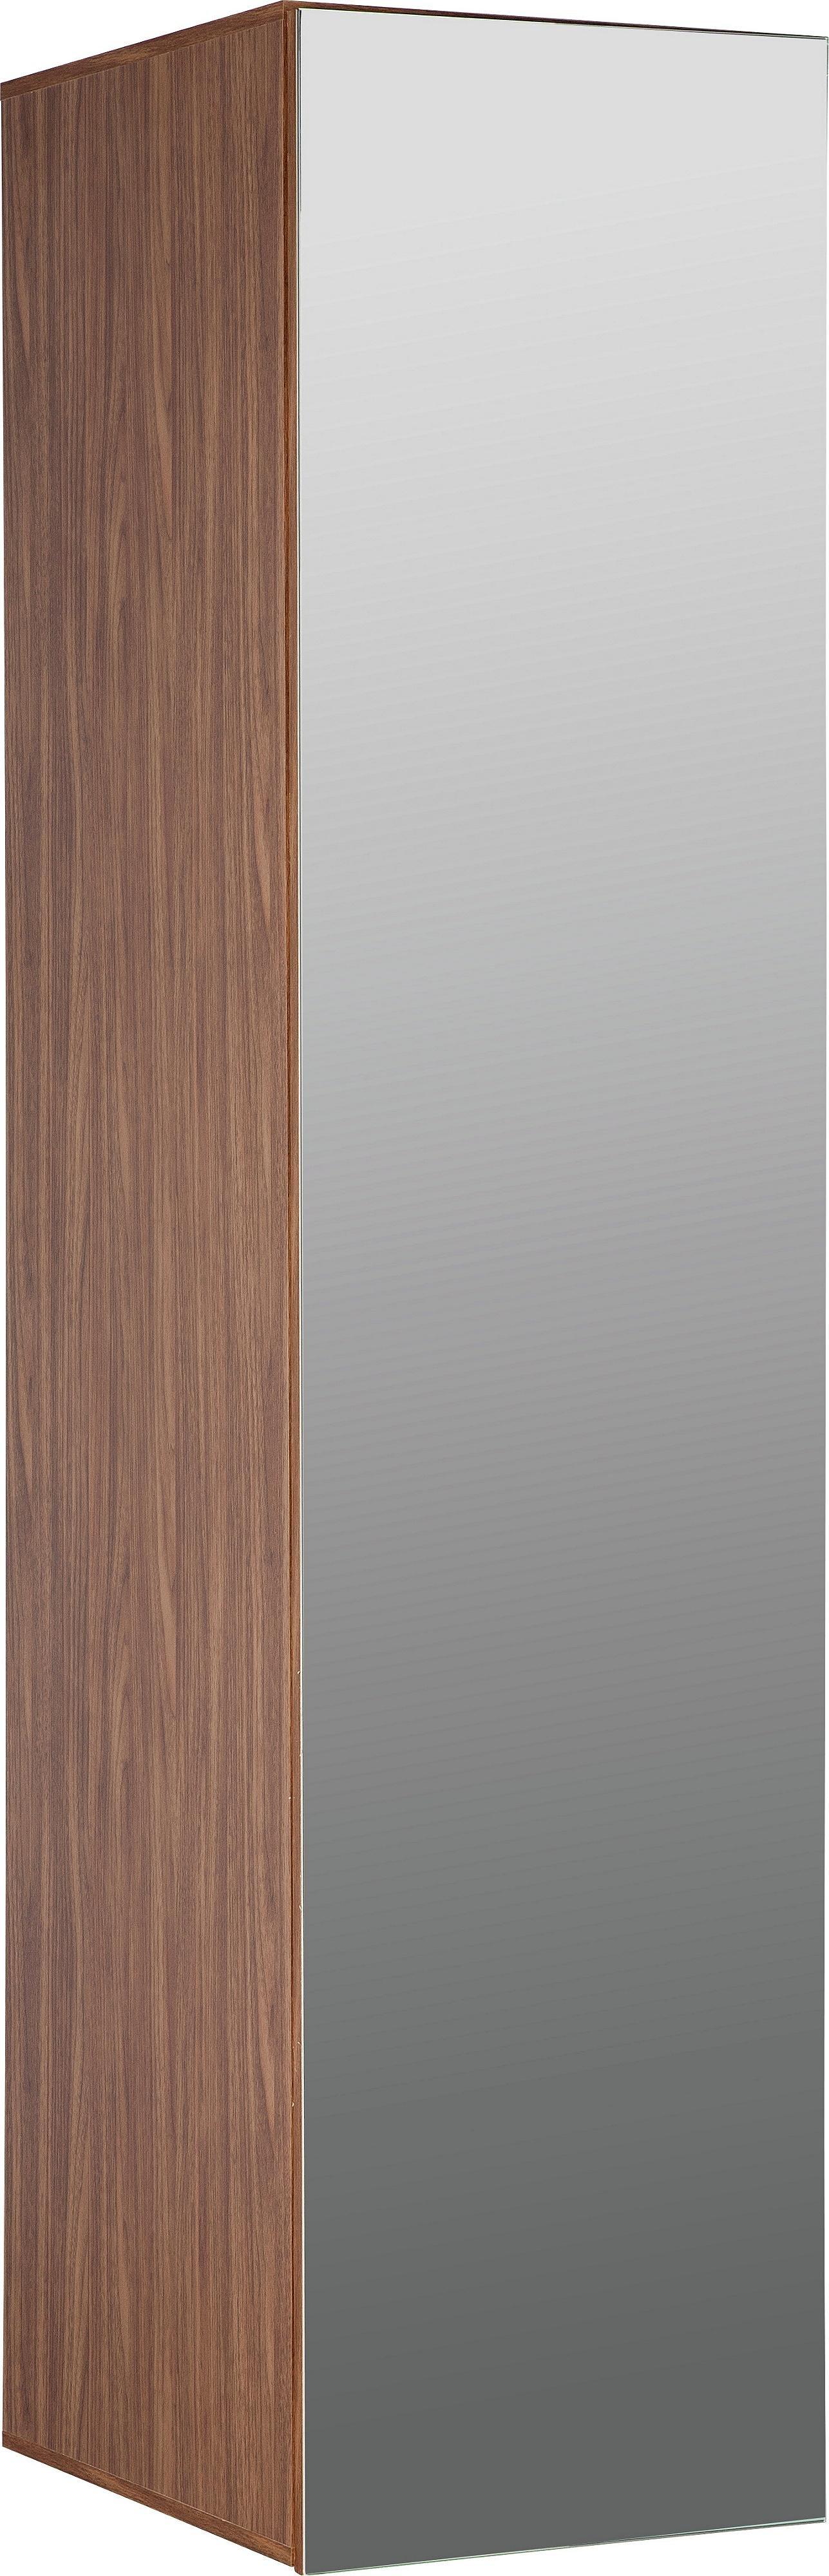 Argos Home Atlas Walnut Effect 1 Door Mirrored Tall Wardrobe